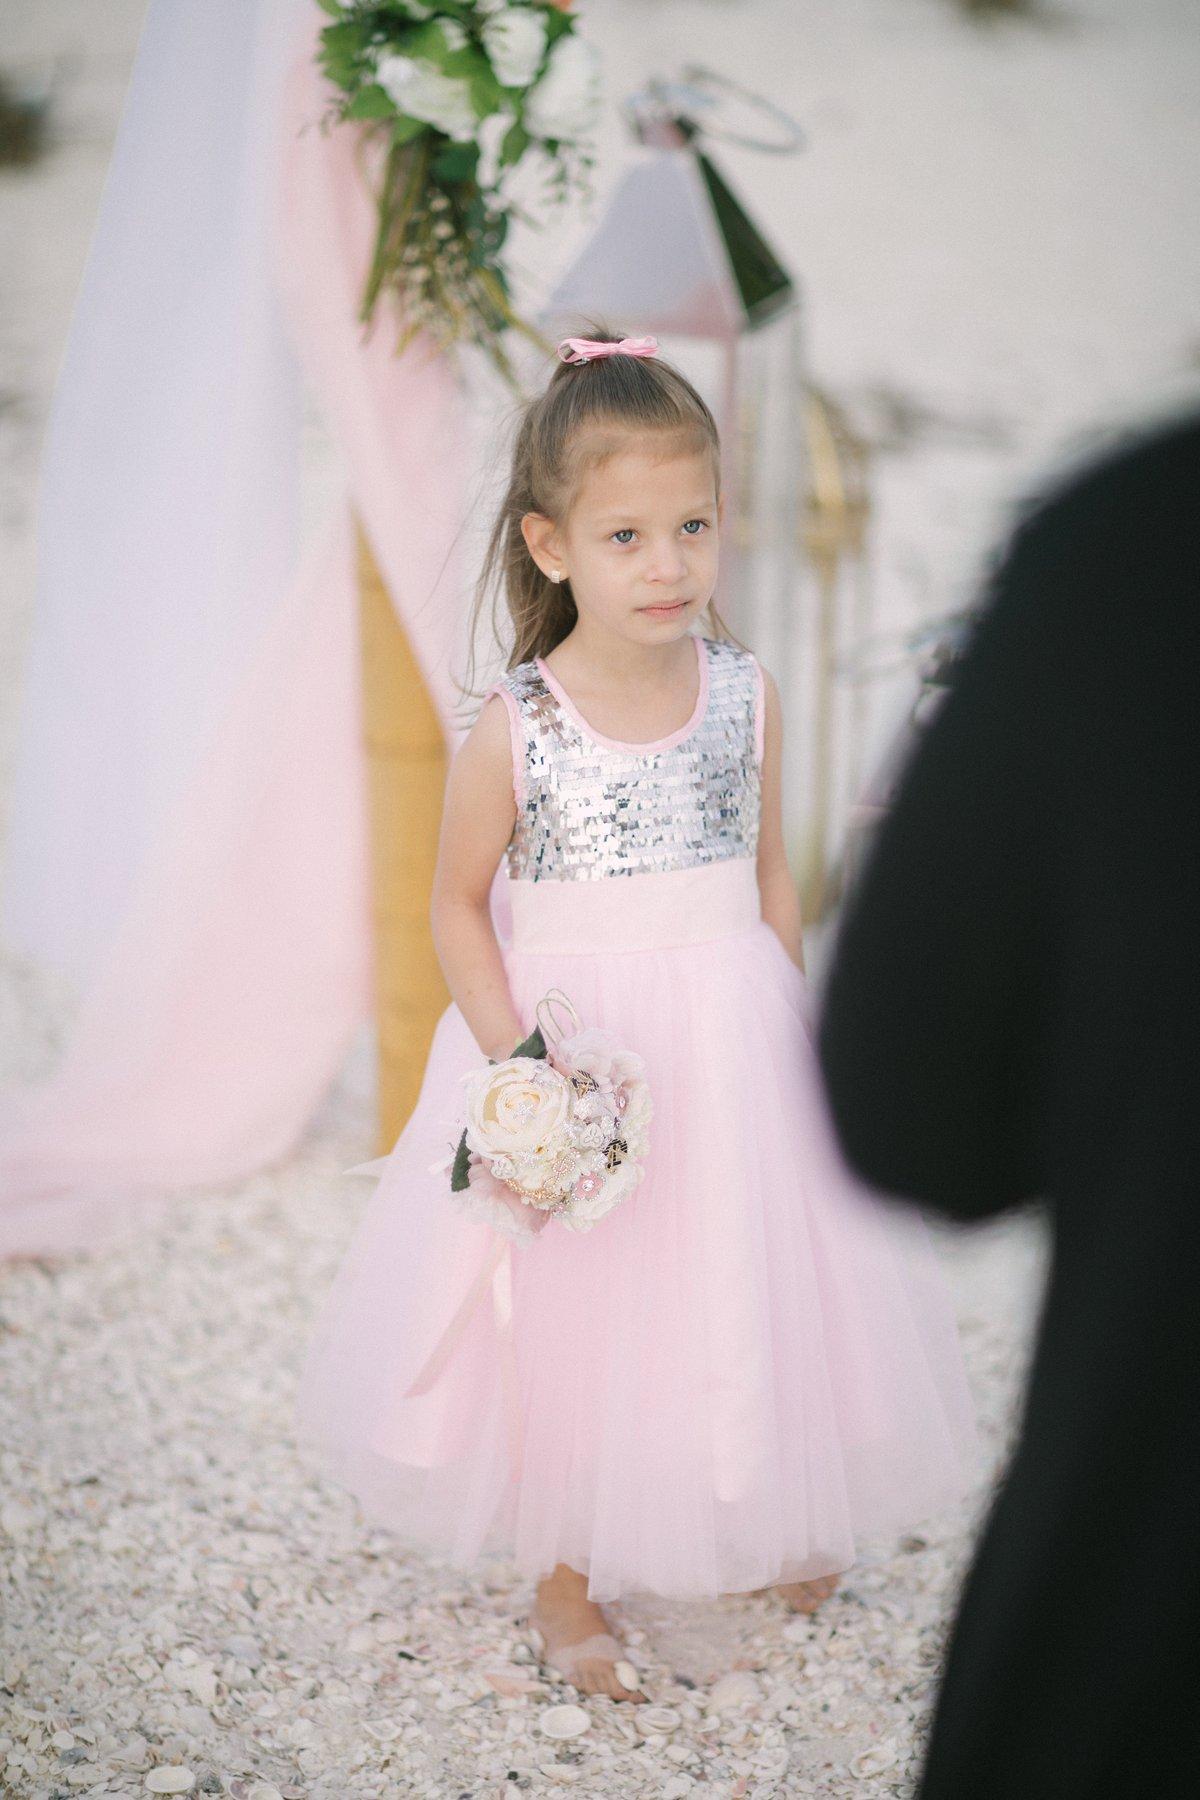 ft-myers-miami-fort-lauderdale-florida-beach-wedding-decoration-4 Artistic Pink Beach Wedding Decoration